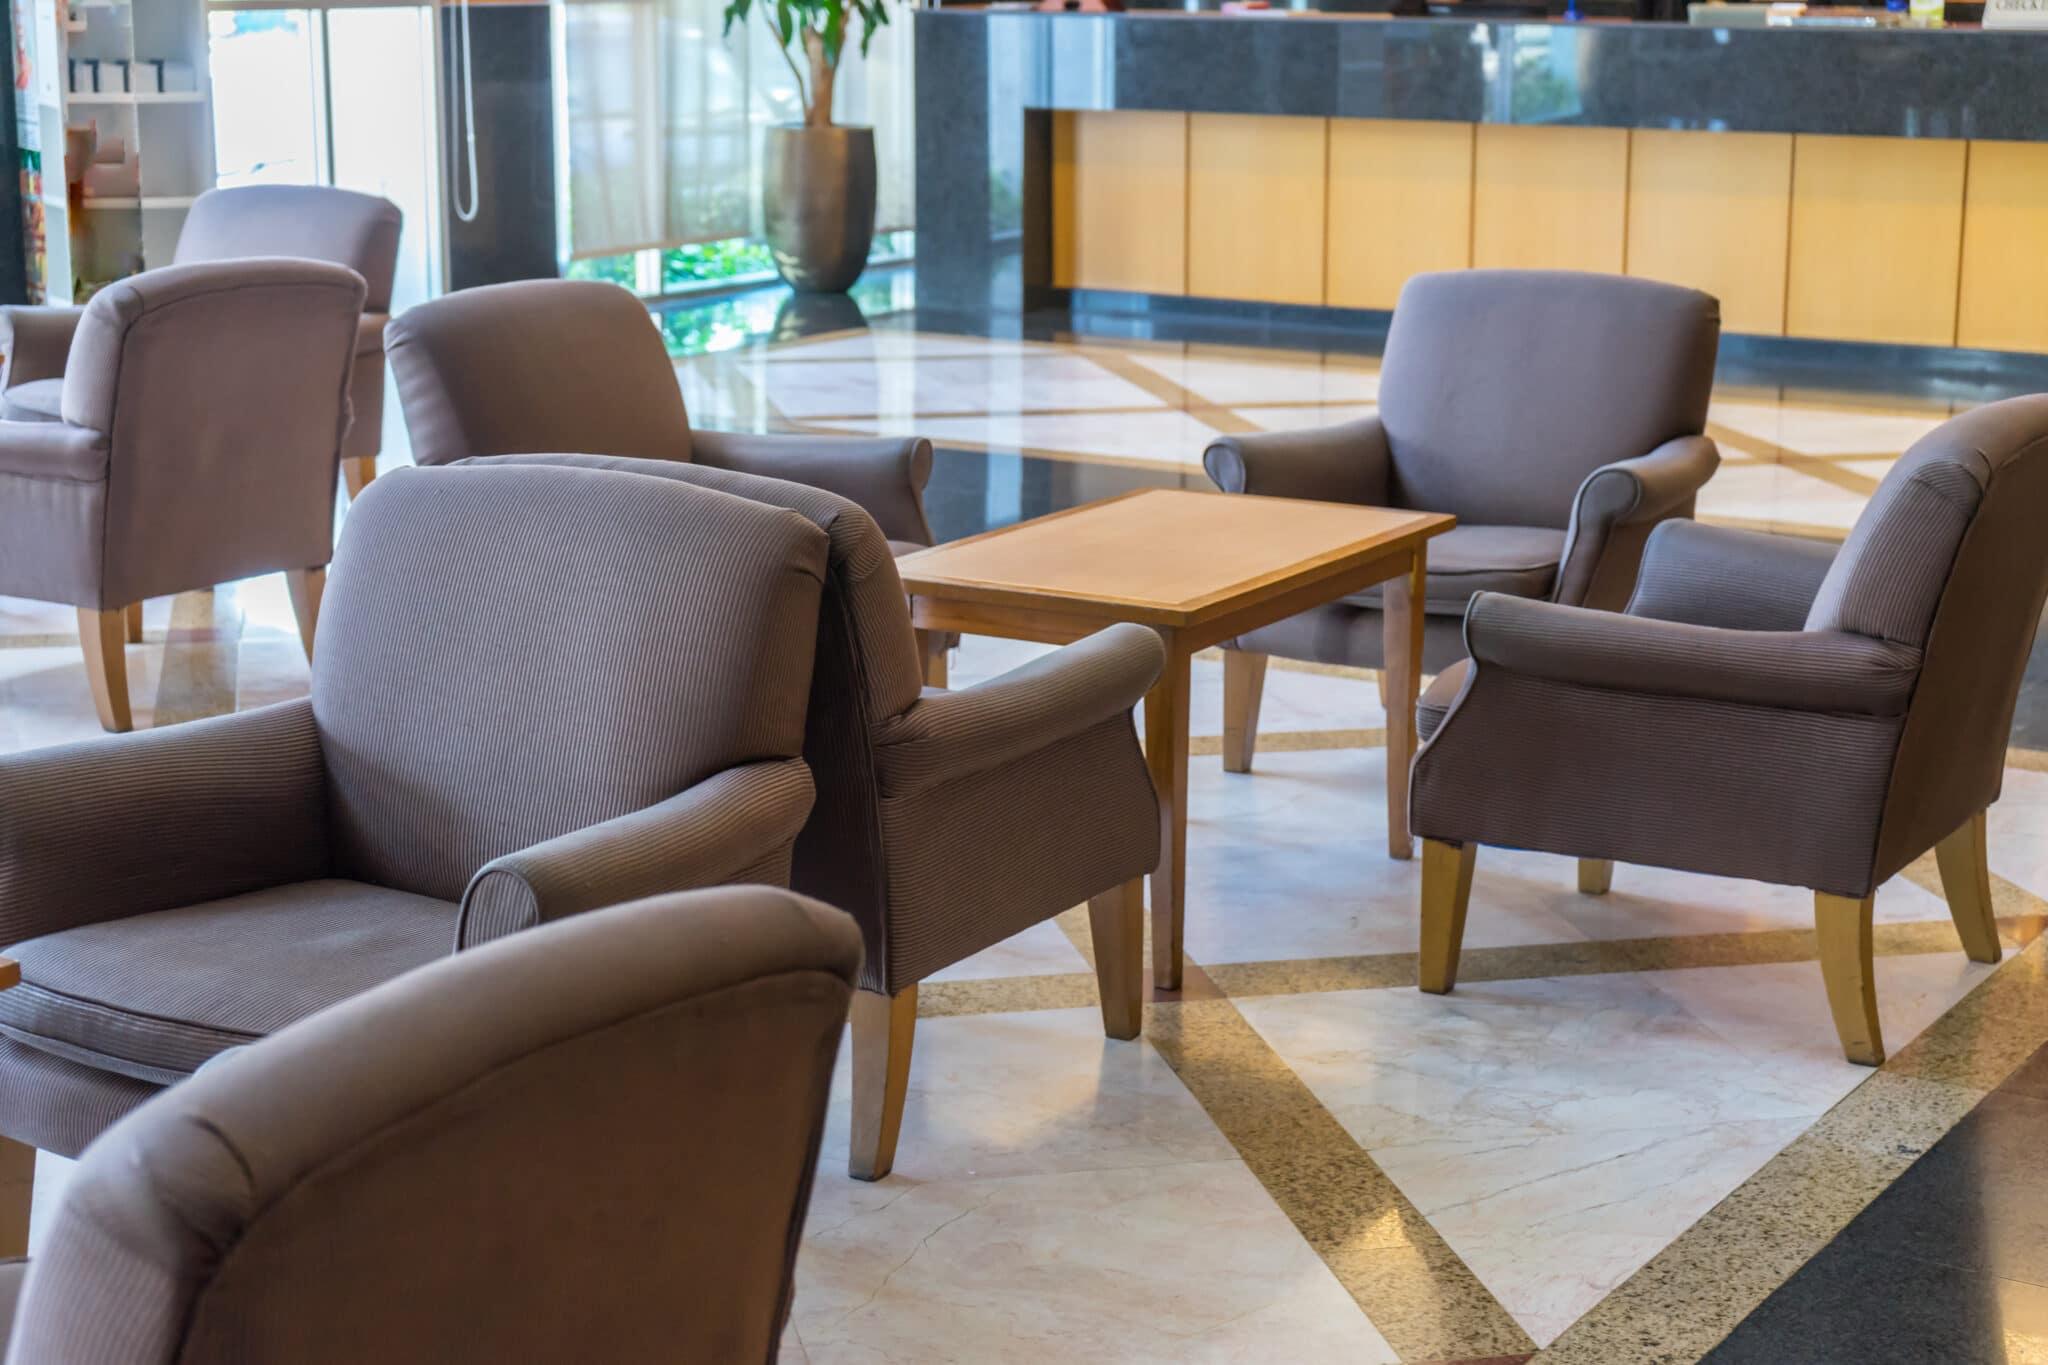 commercial upholstery cleaning in kenosha, business upholstery cleaning, commercial furniture cleaning in kenosha